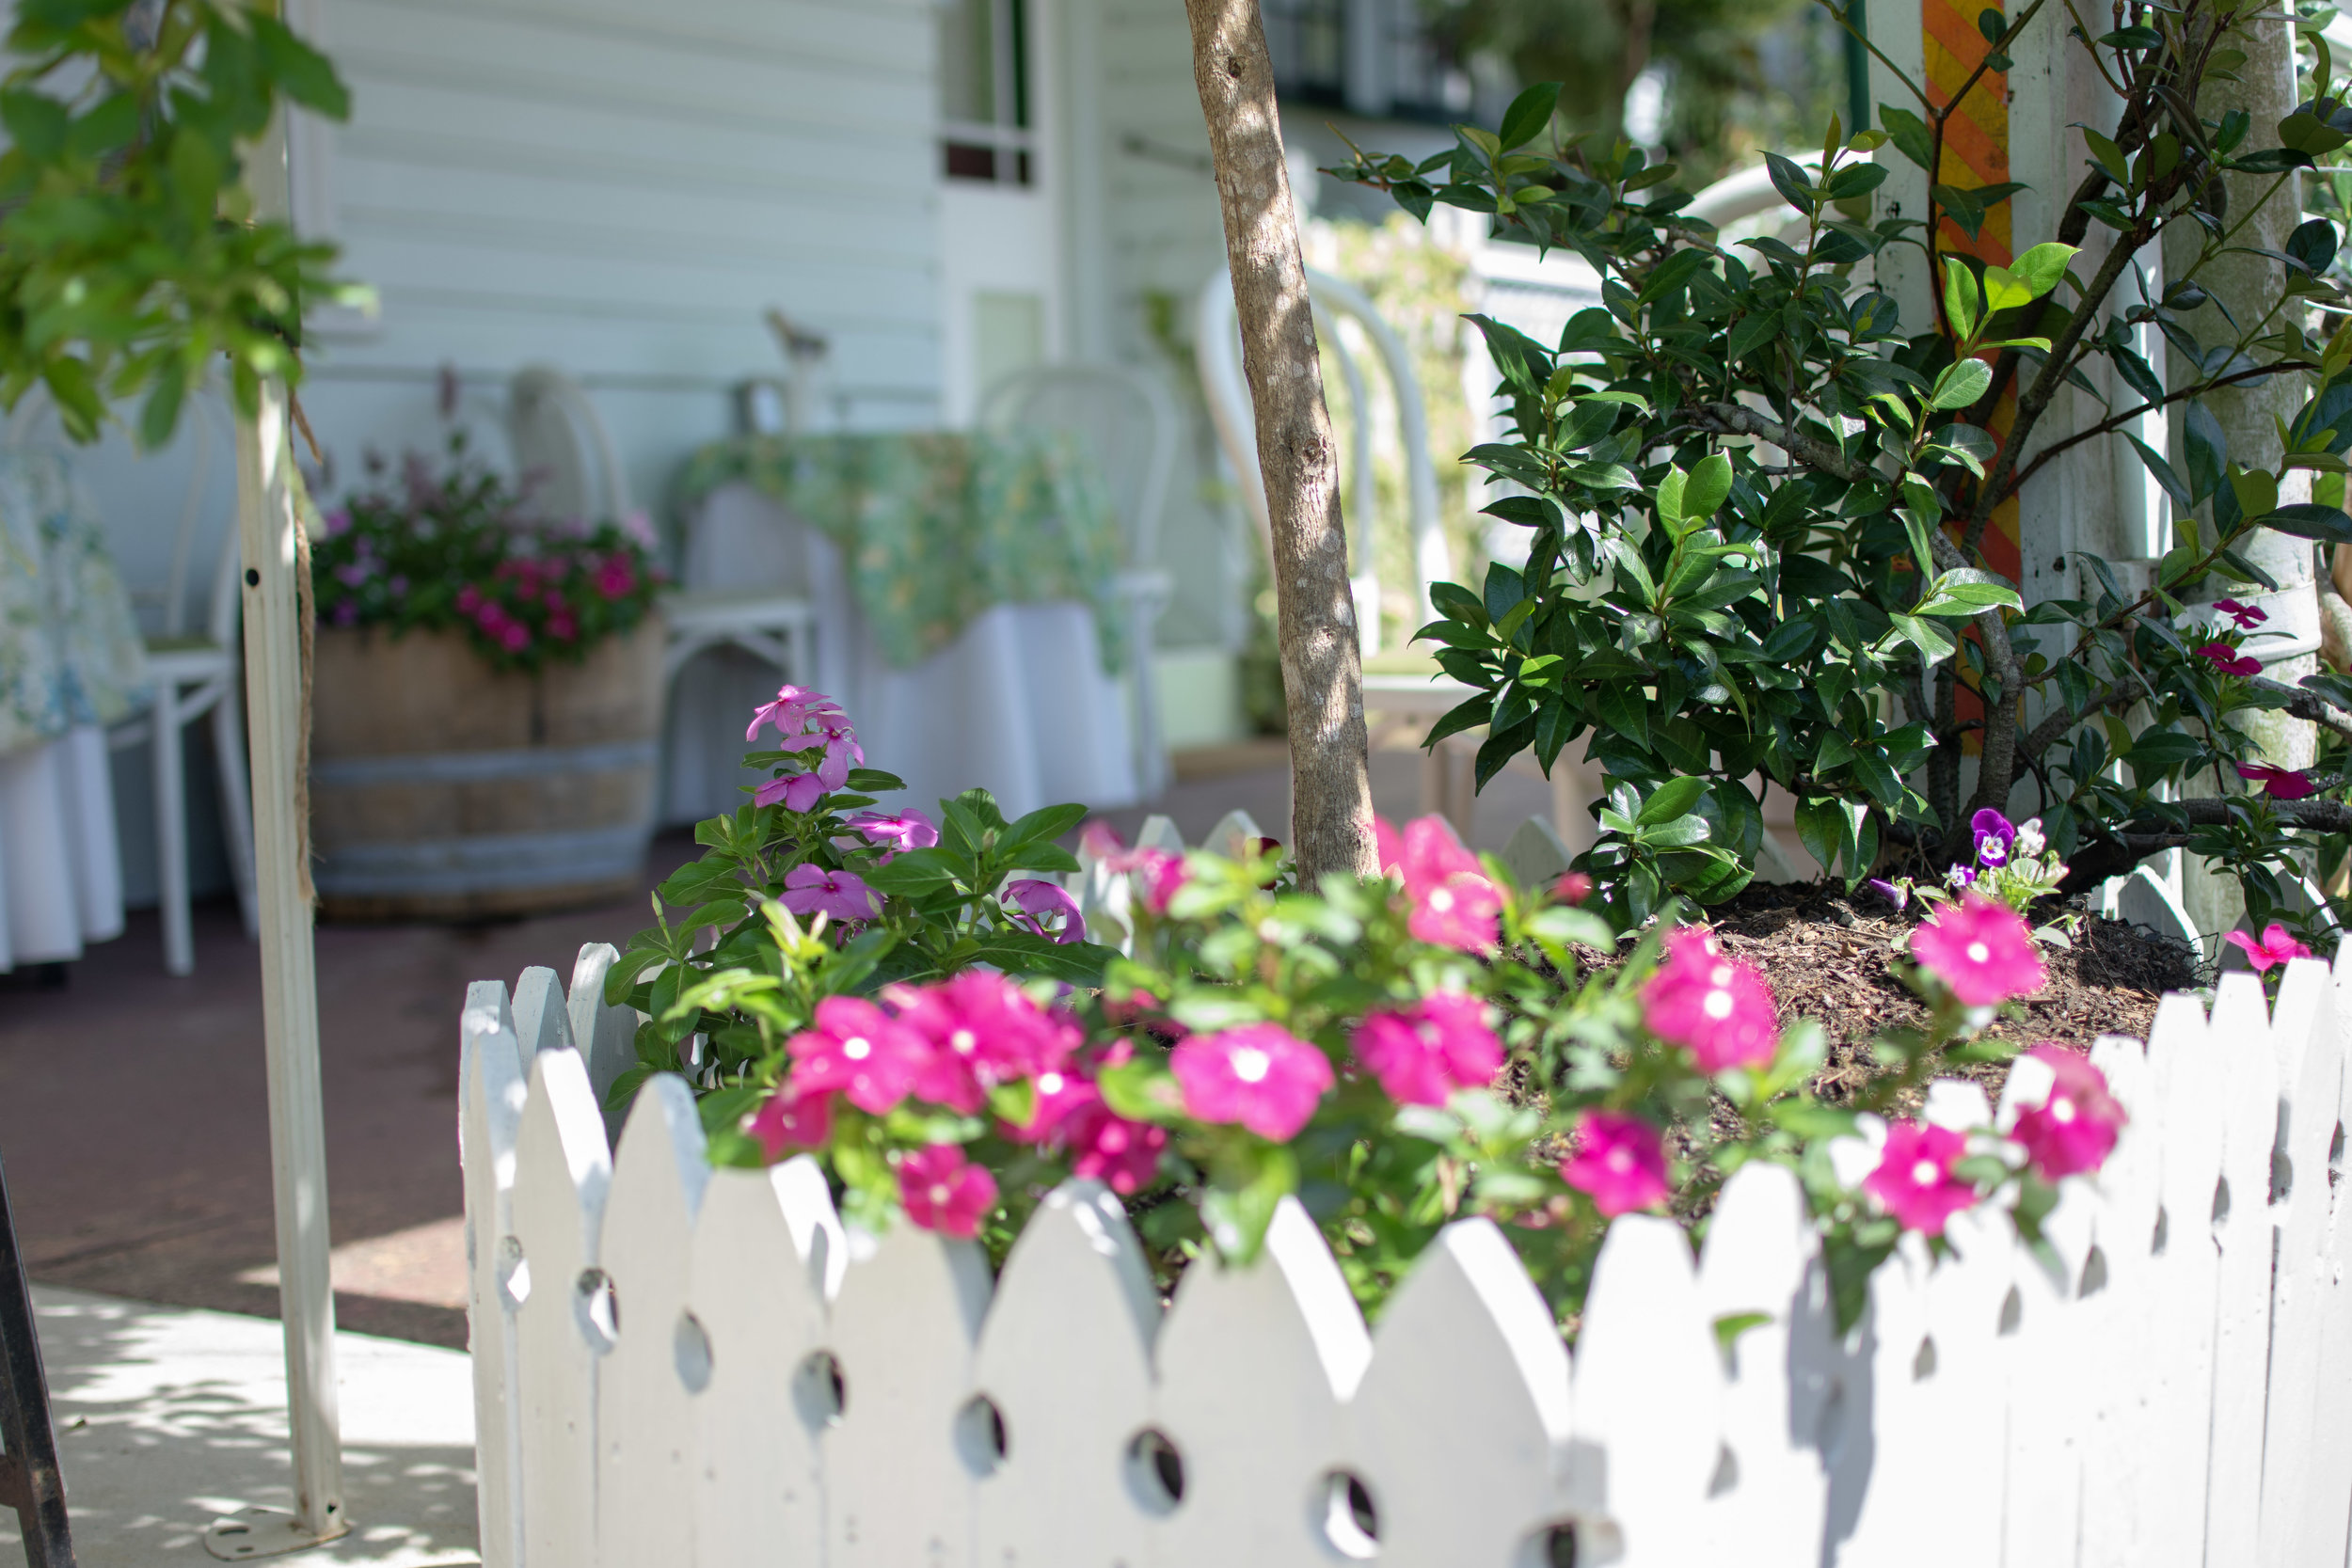 brooke flower bed.jpg